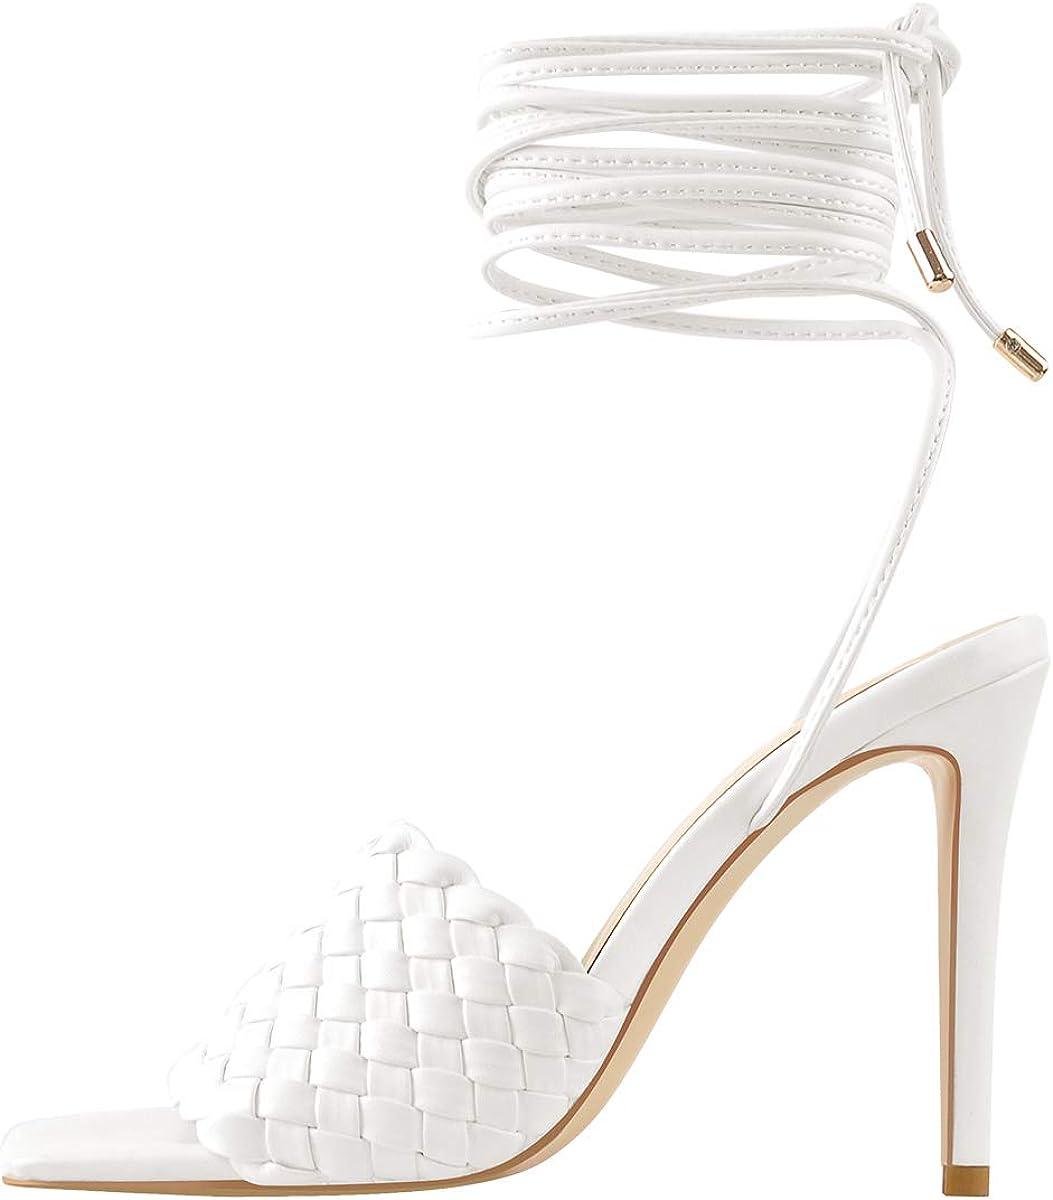 onlymaker Women's Stiletto Weave Sandals Open Toe High Heels Lace-up Sandals